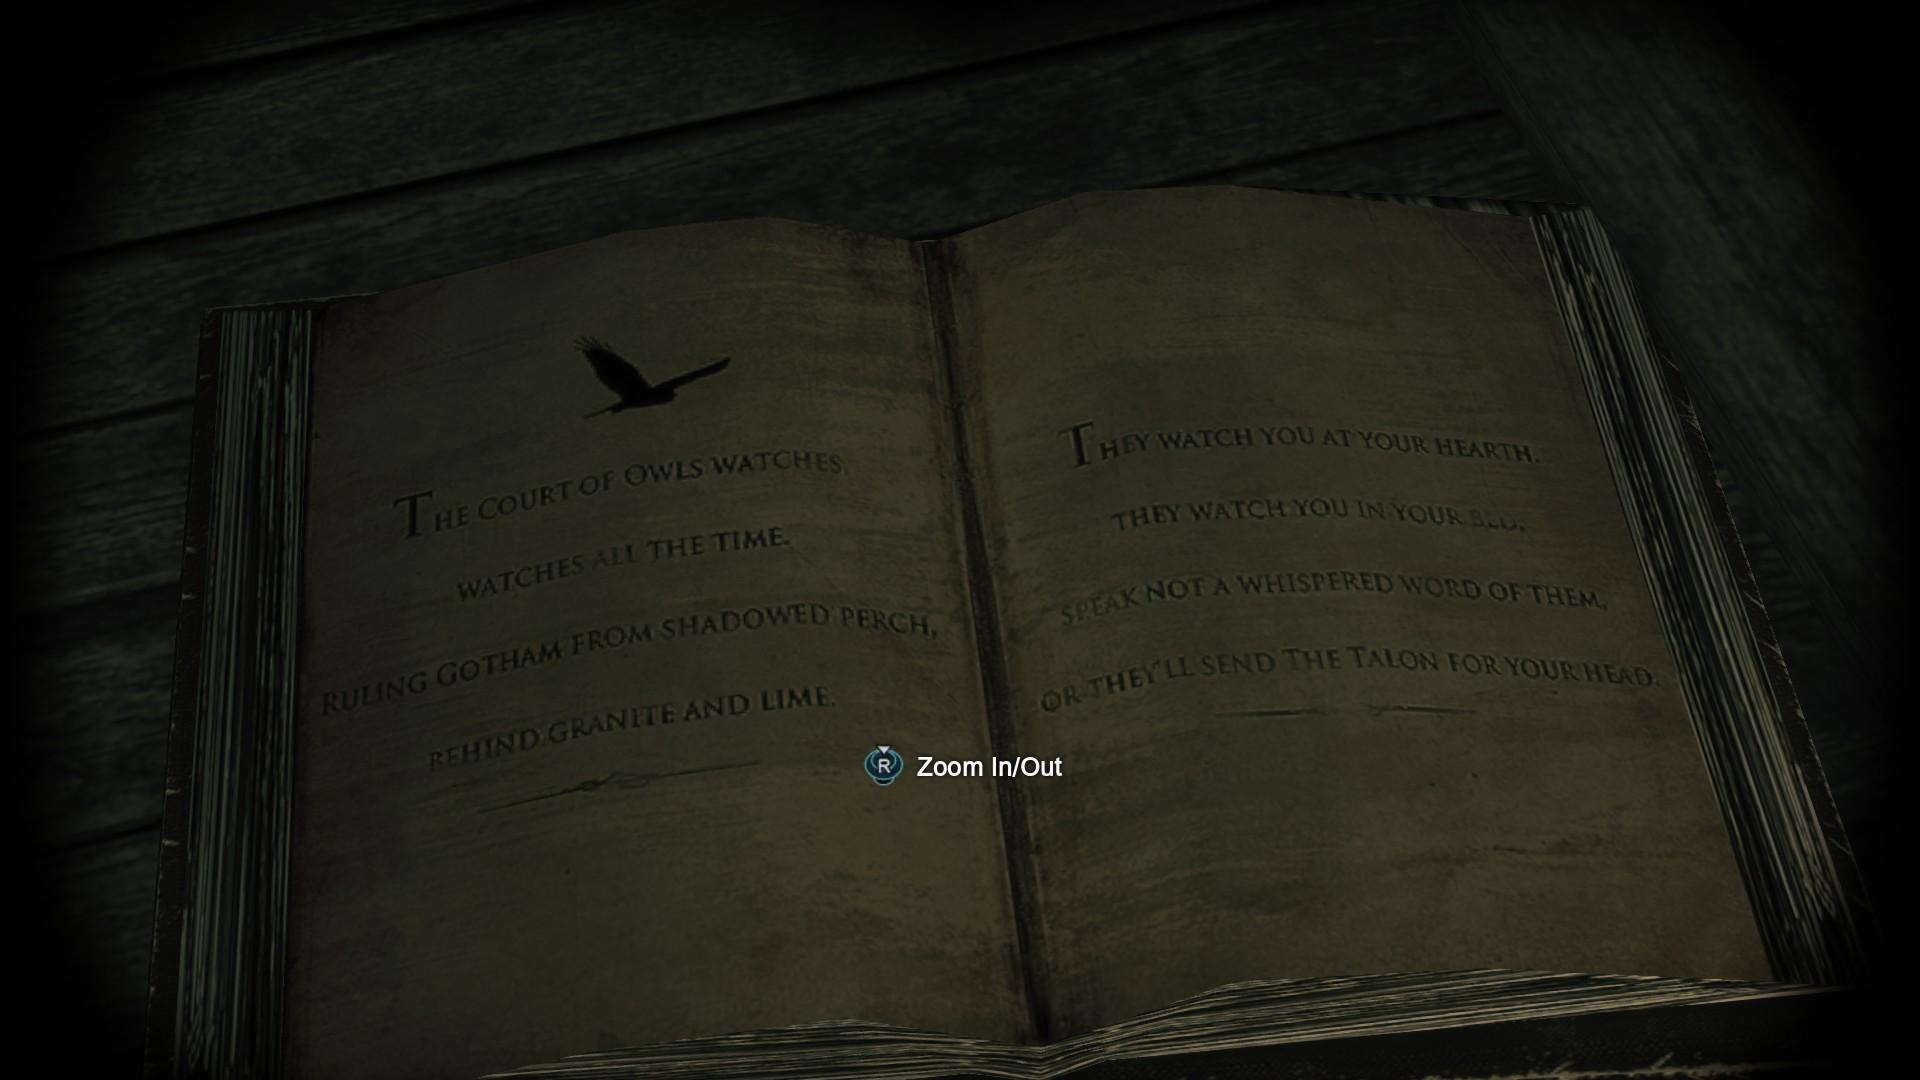 Re: Would Court of Owls make a better Secret Mission ?